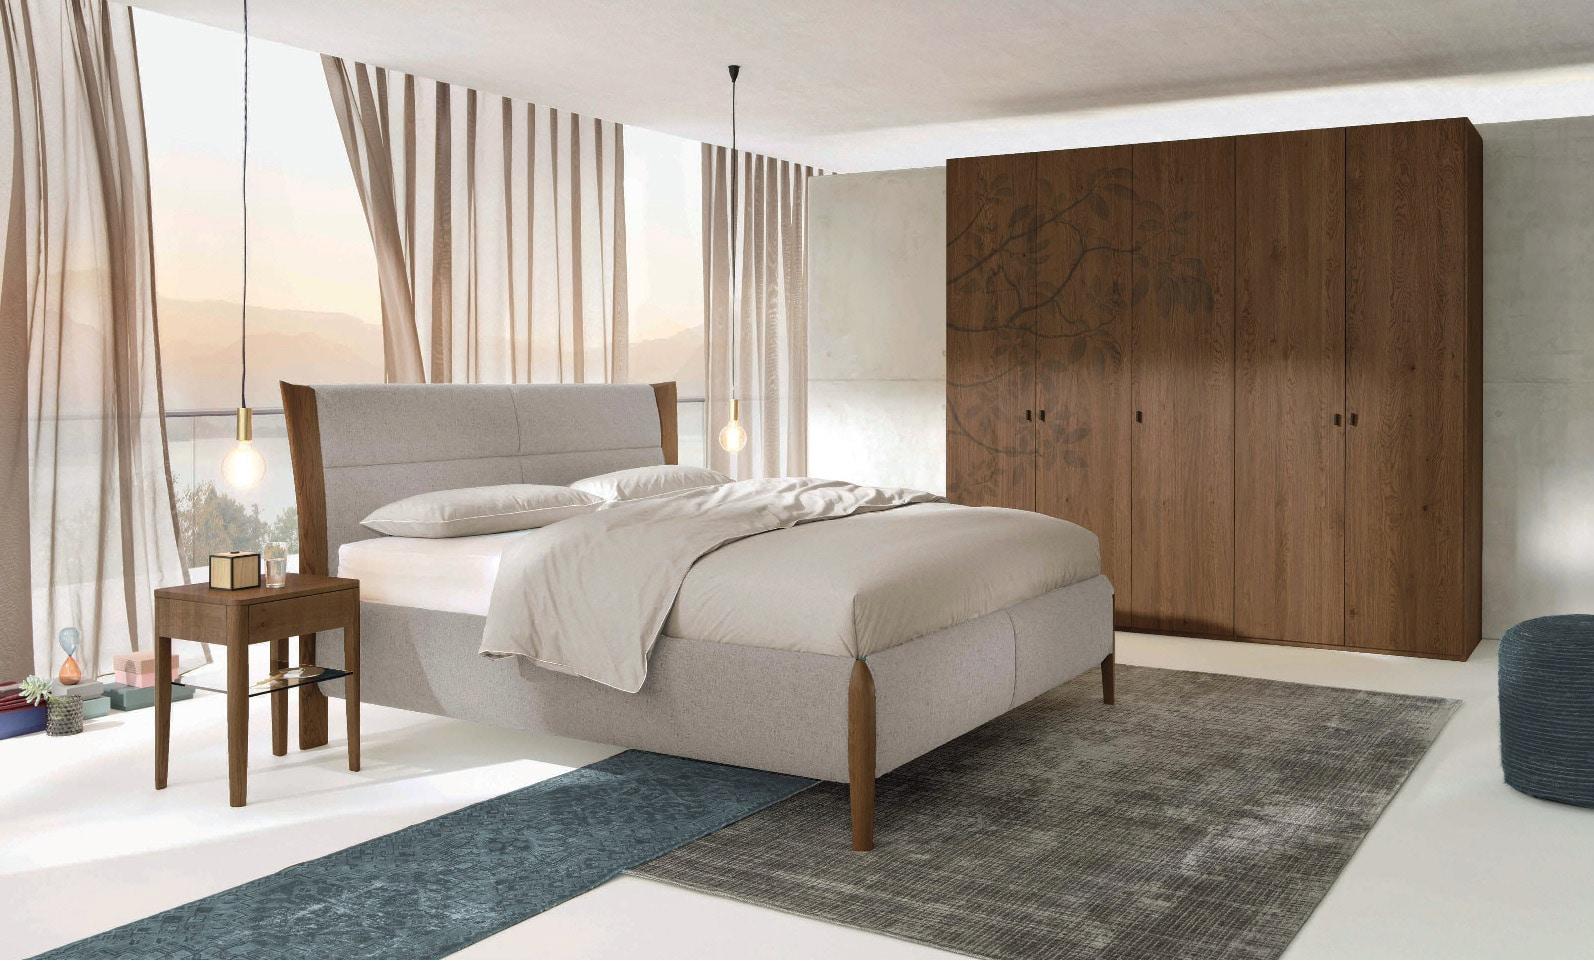 Schlafzimmer Mevisto - Hartmann Naturmöbel